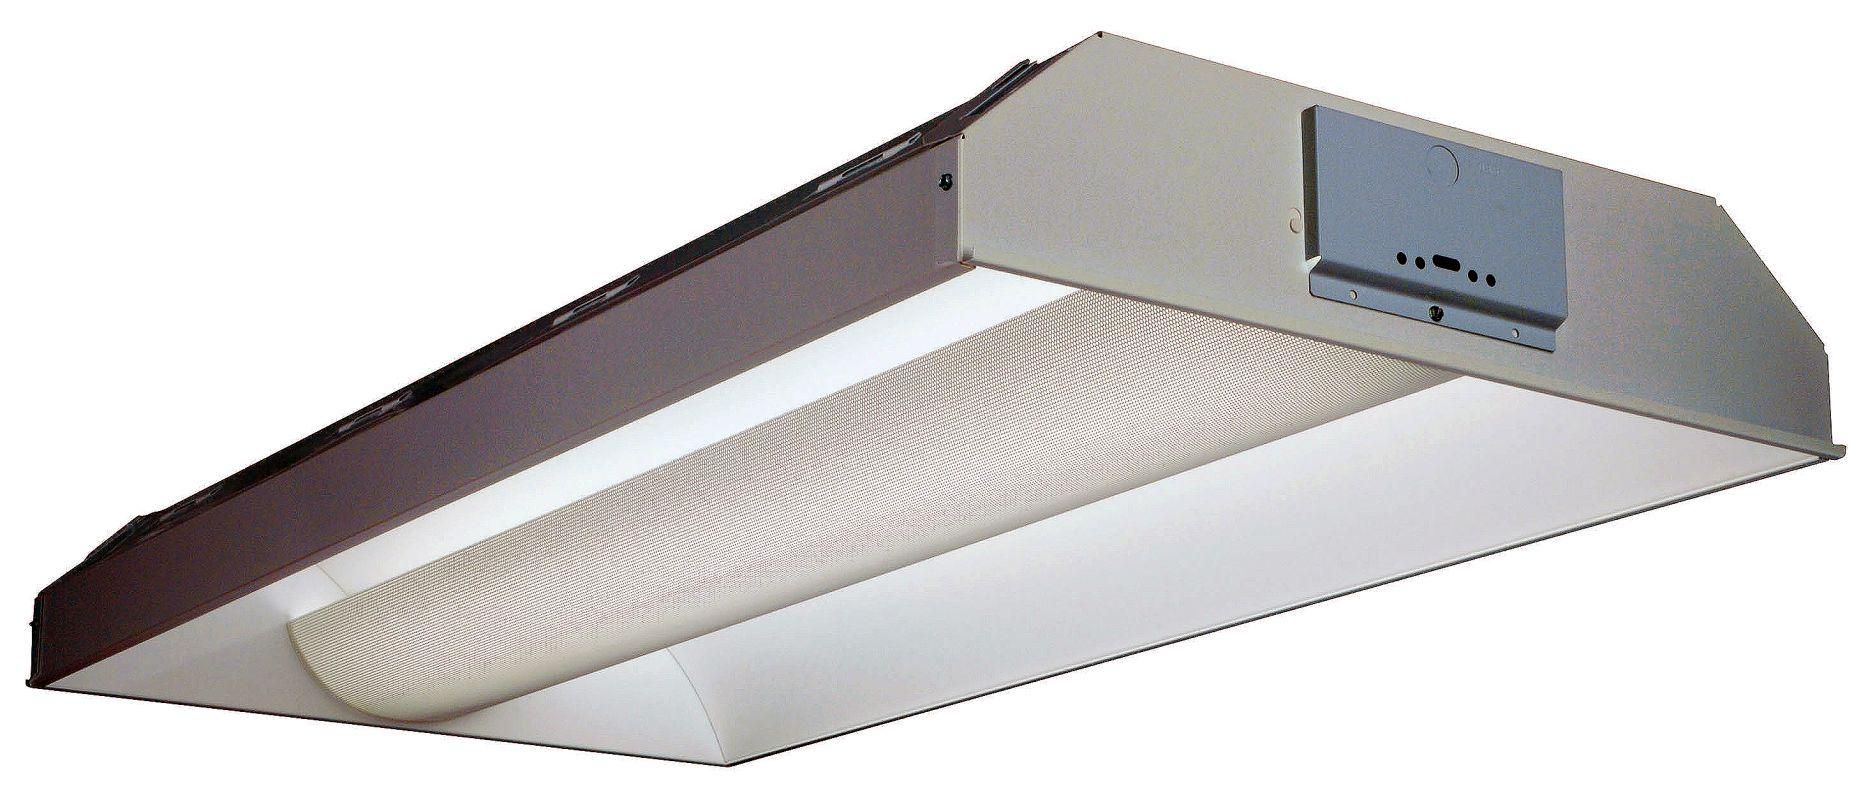 "Lithonia Lighting 2AV G 3 32 MDR MVOLT GEB10IS 3 Light 48"" Fluorescent"